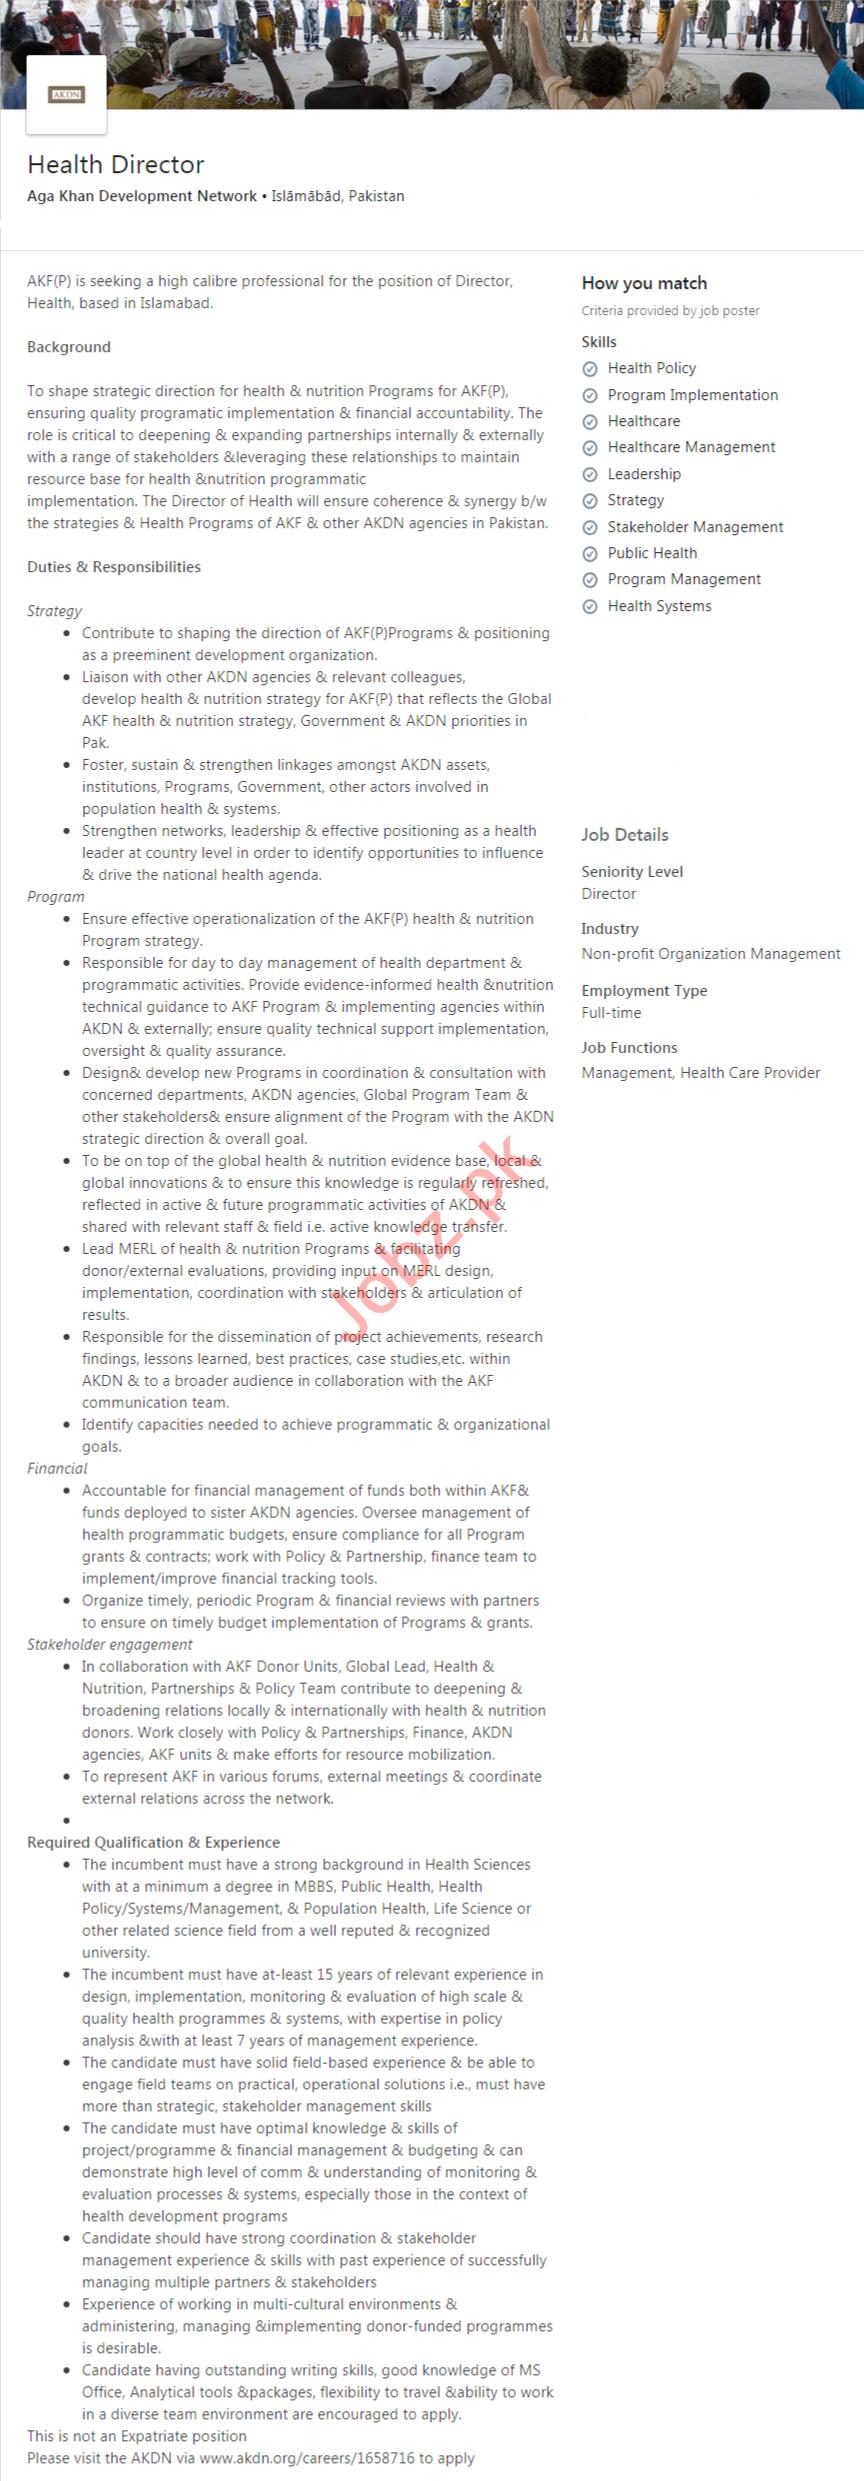 Aga Khan Development Network Islamabad Jobs 2020